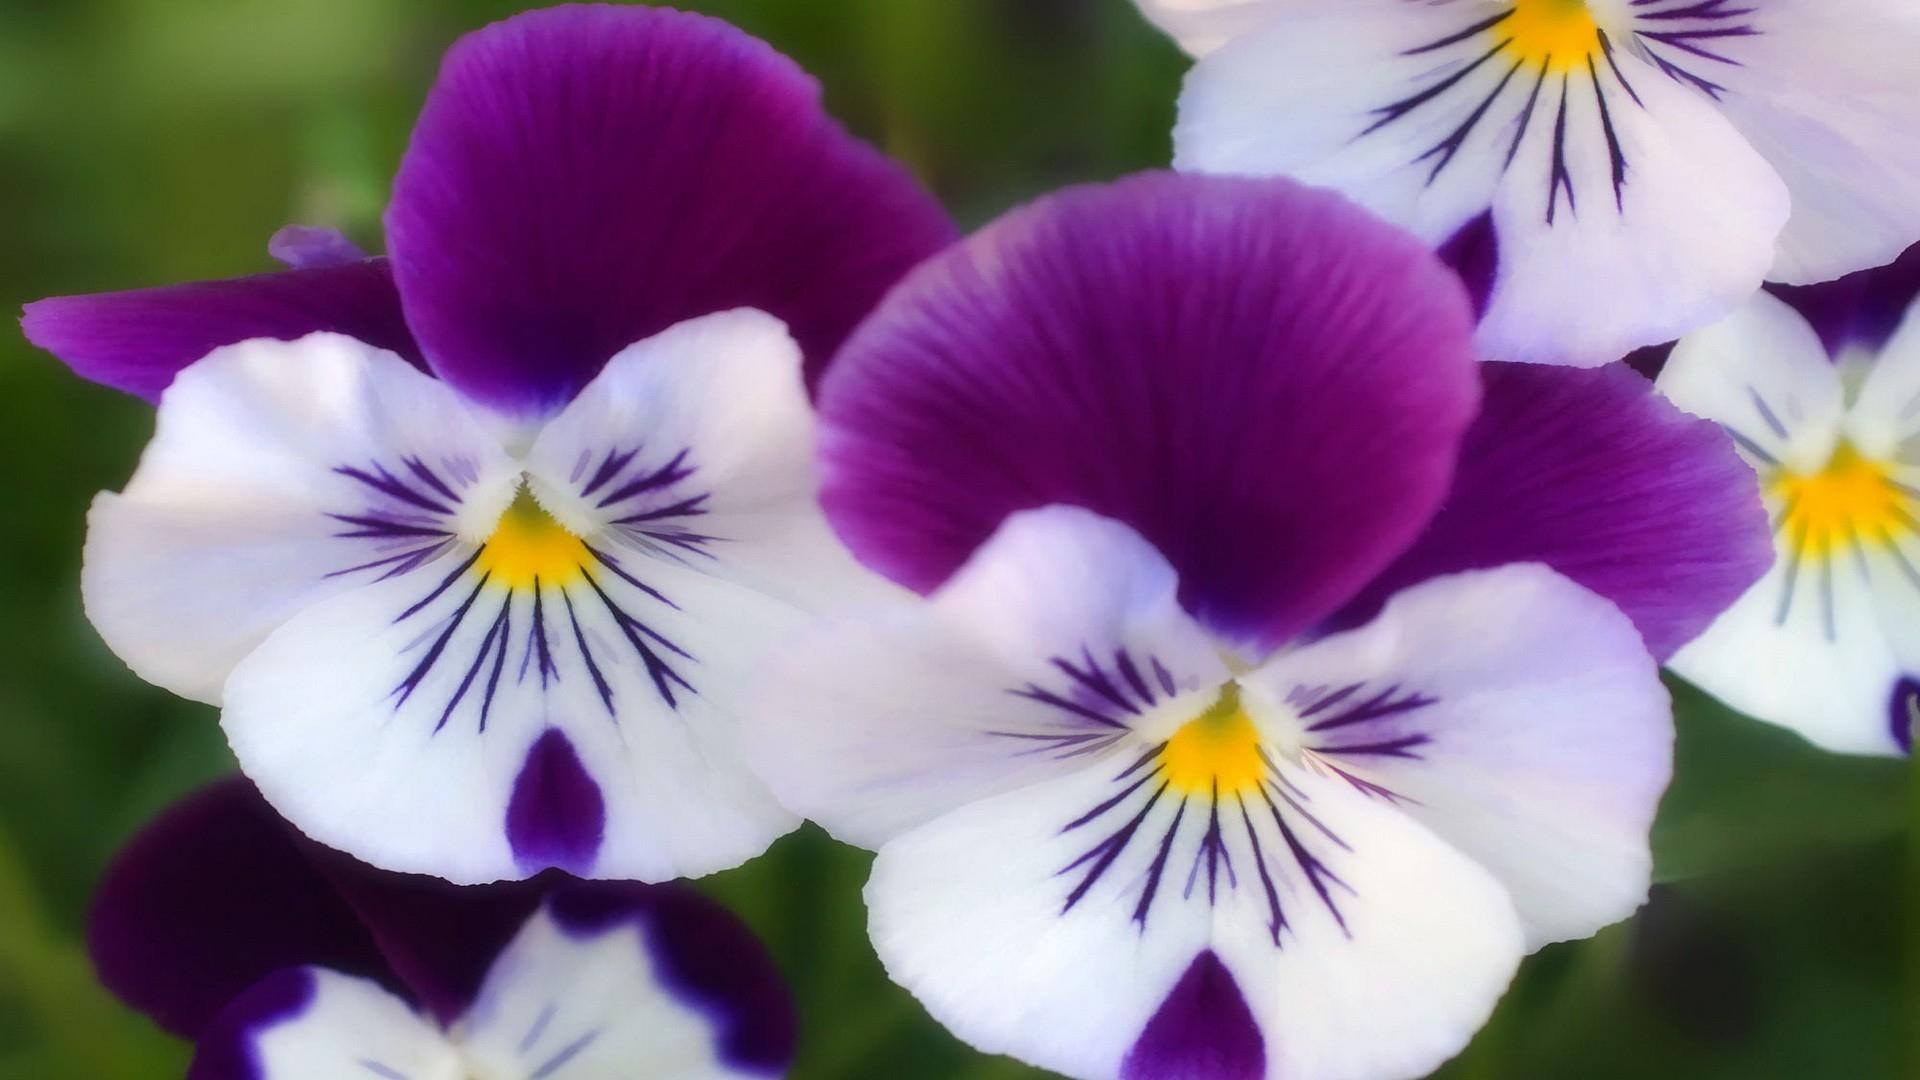 Purple white flowers wallpaper  1920x1080  31516